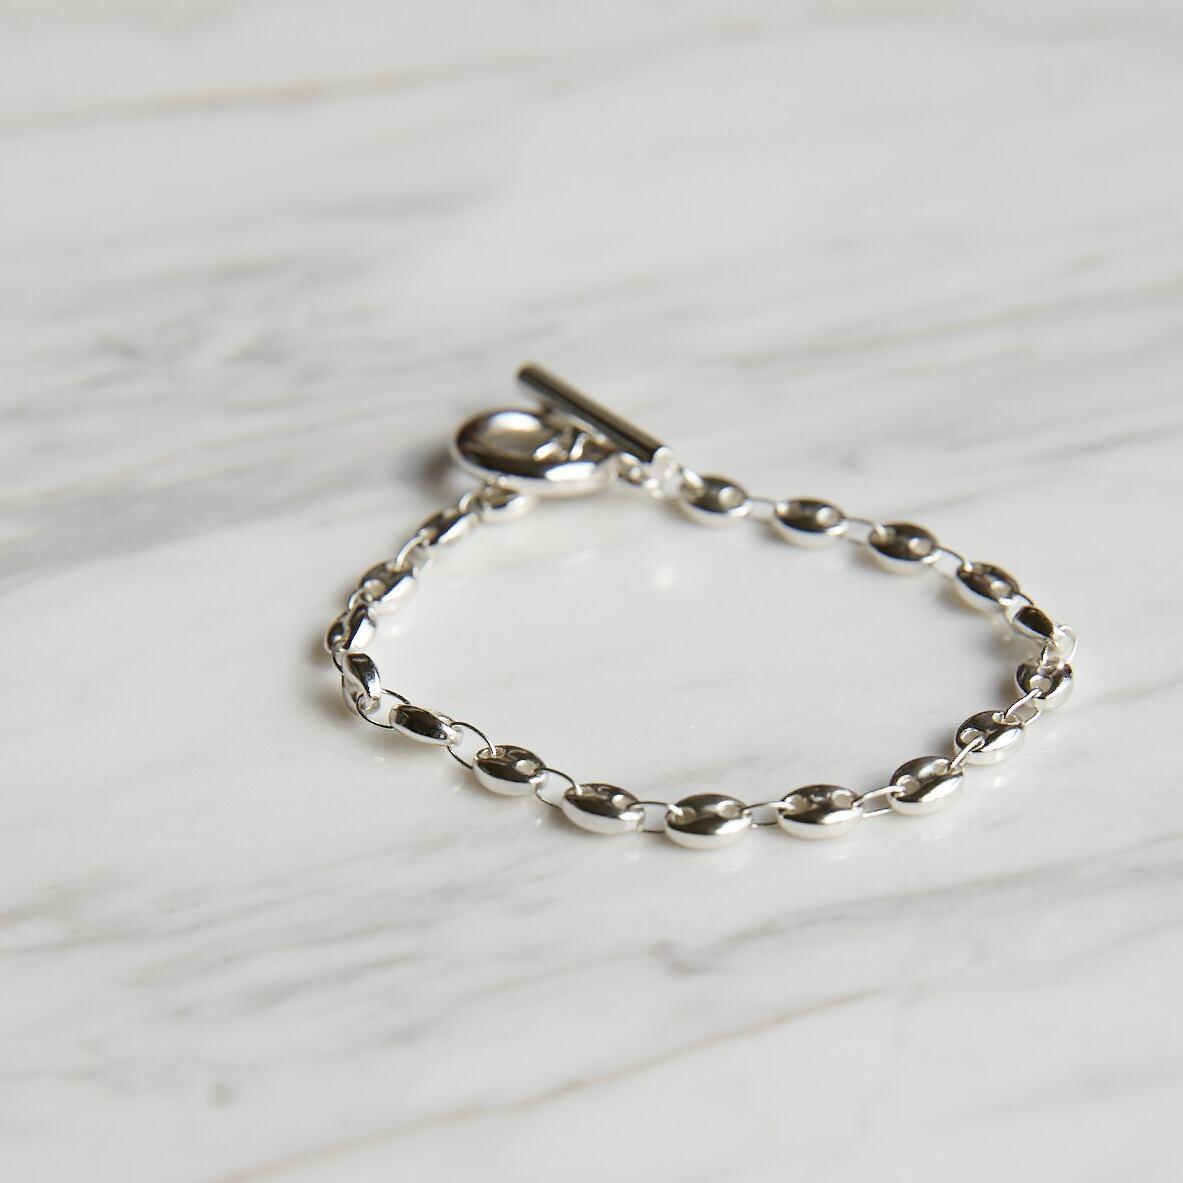 R/nim-2 Bracelet